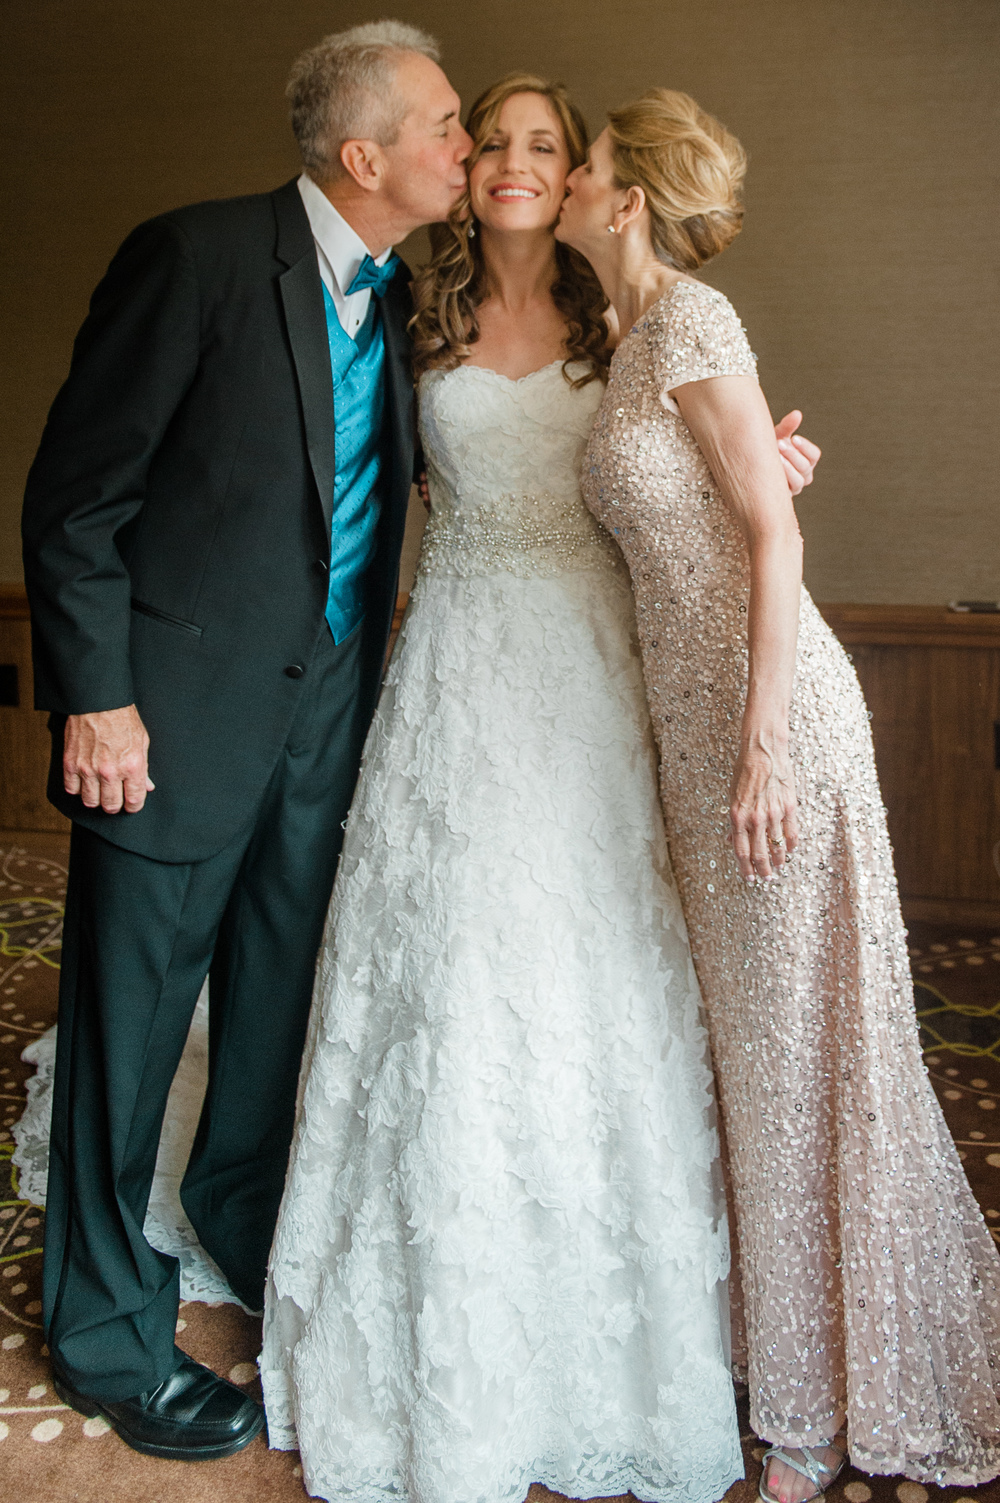 Cincinnati Dayton Wedding Photography by AndreaBelleStudios.com